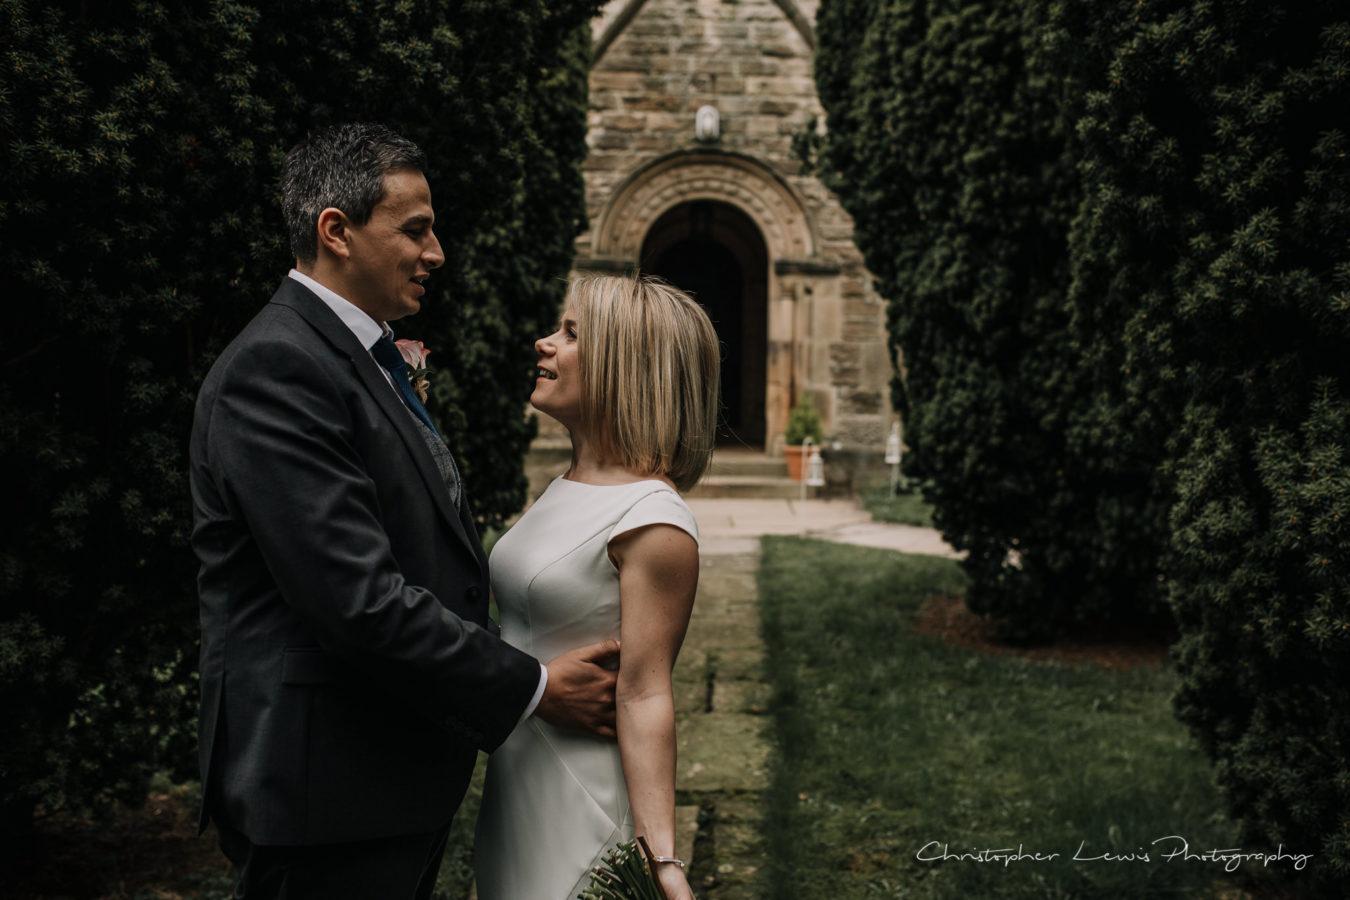 Thief-Hall-Wedding-Christopher-Lewis-Photography-40